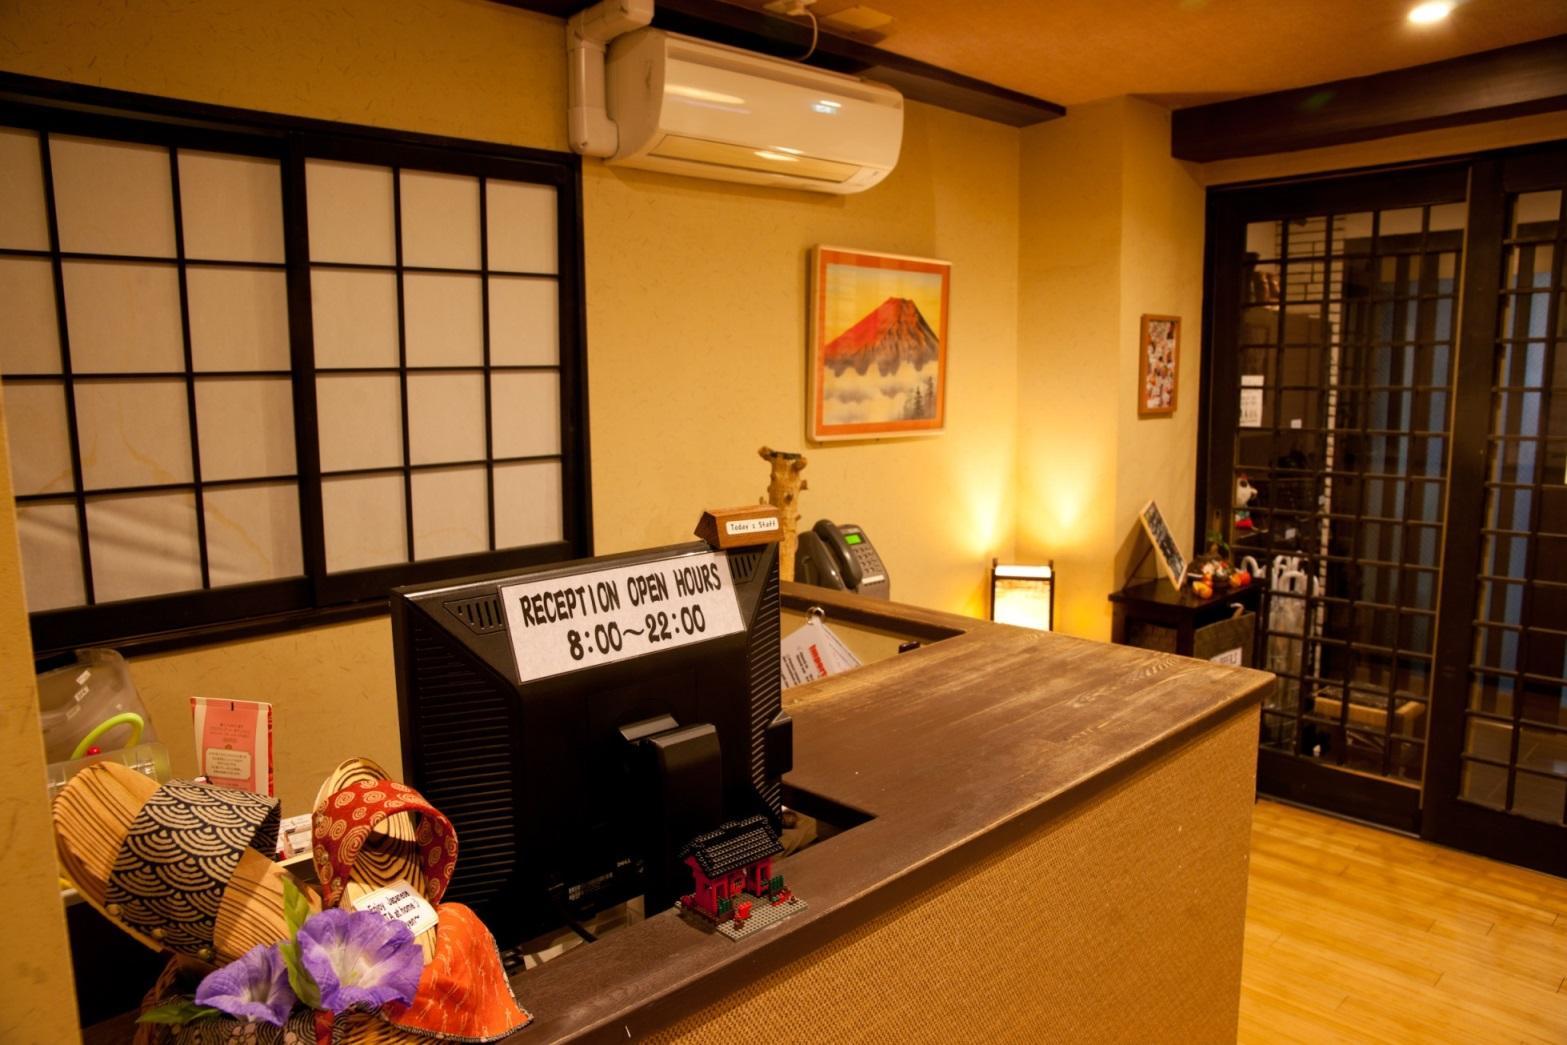 東京K's House東京綠洲 - 優質青年旅館 (K's House Tokyo Oasis - Quality Hostel)線上訂房|Agoda.com